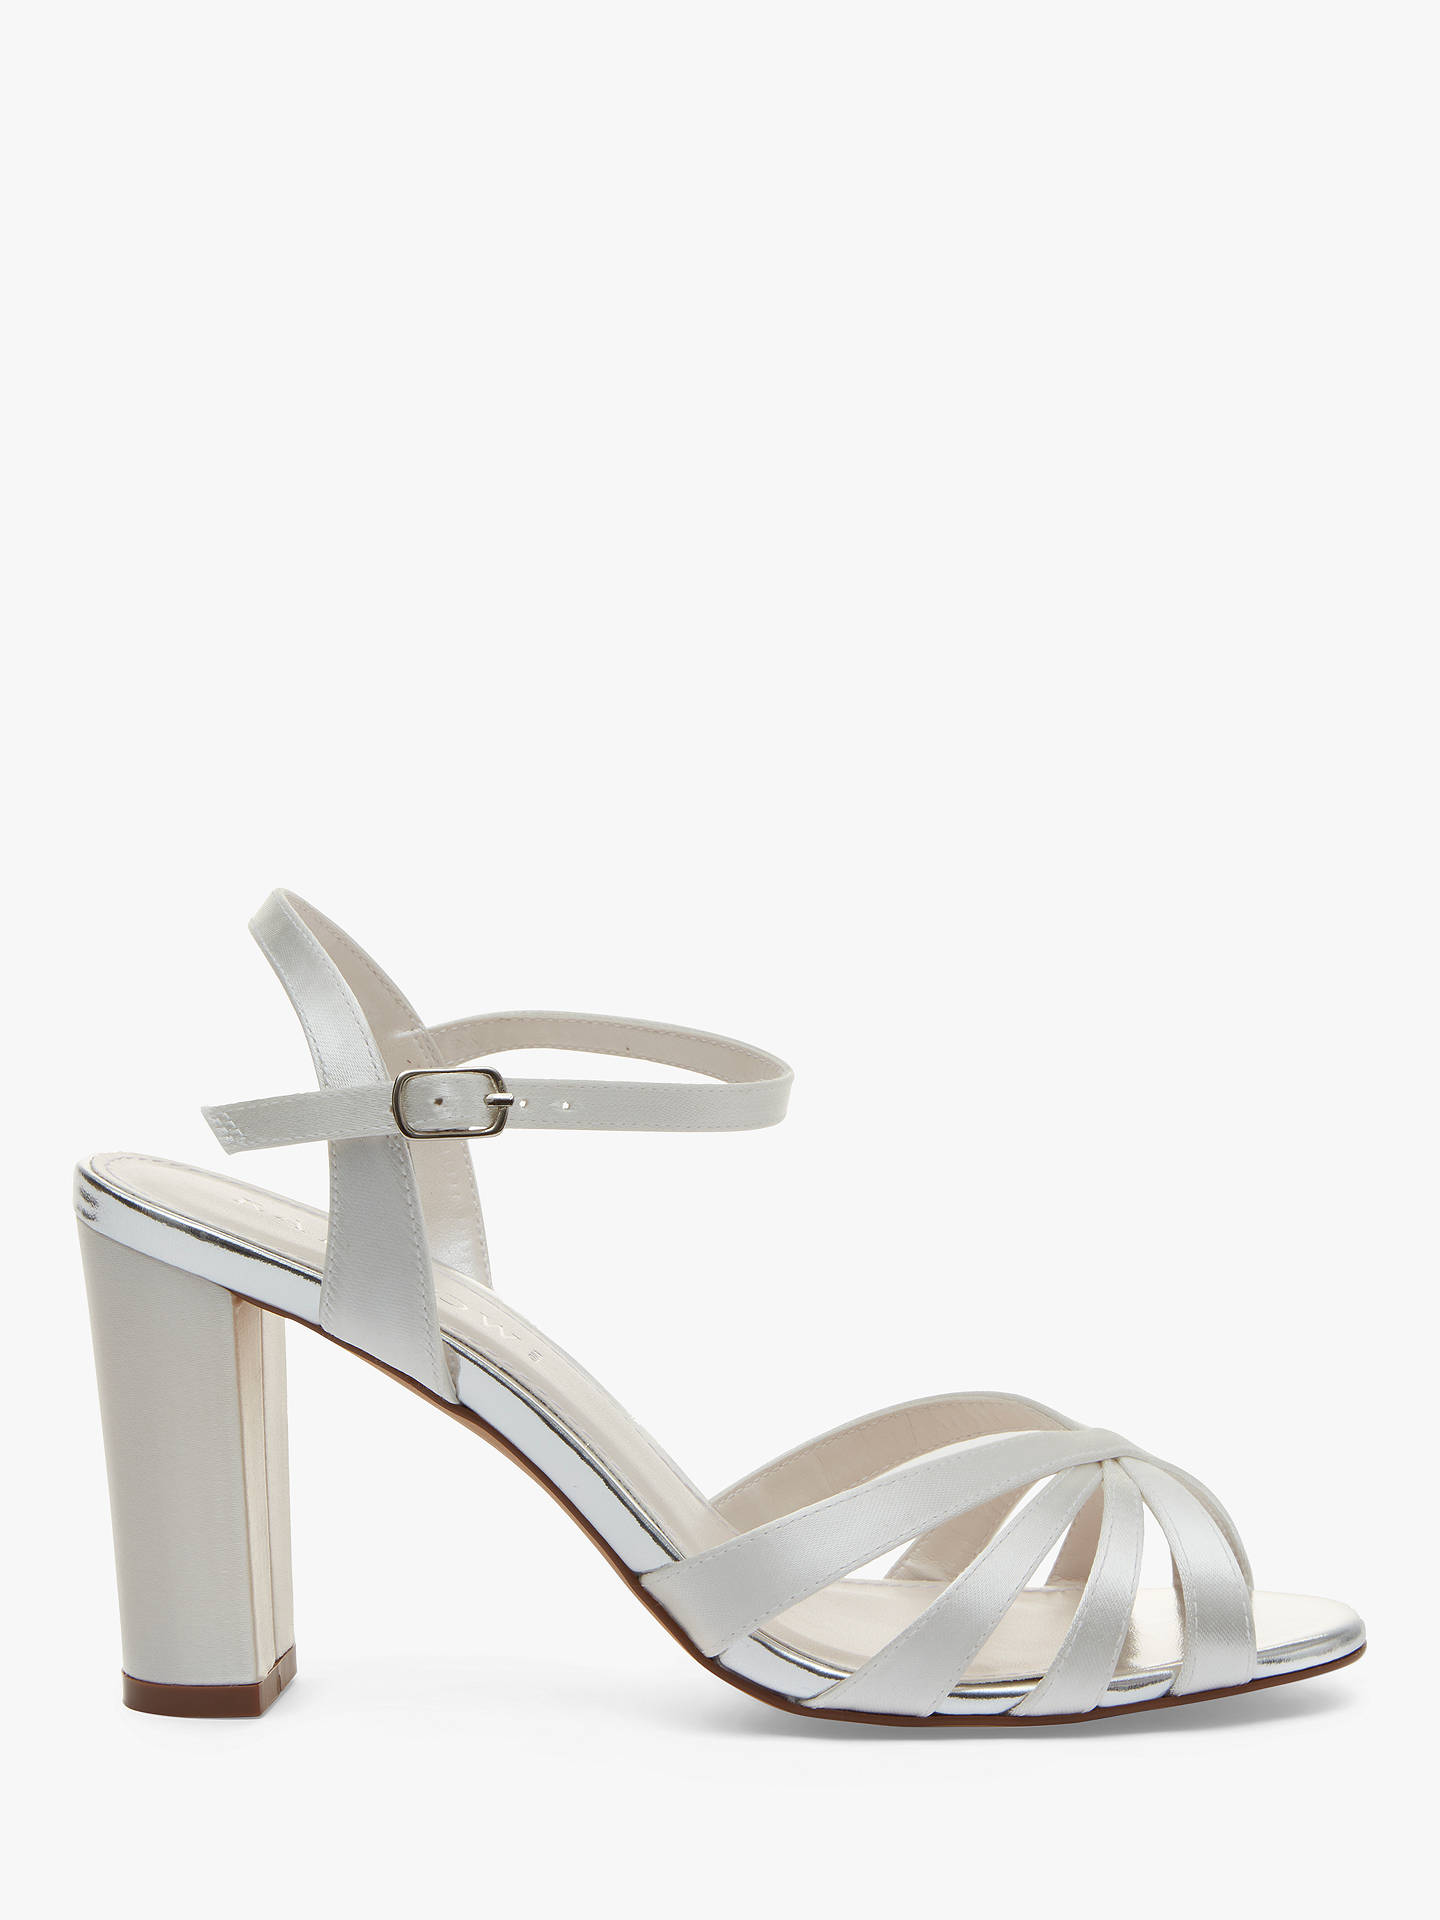 ca7e6845208 Buy Rainbow Club Blake Block Heel Sandals